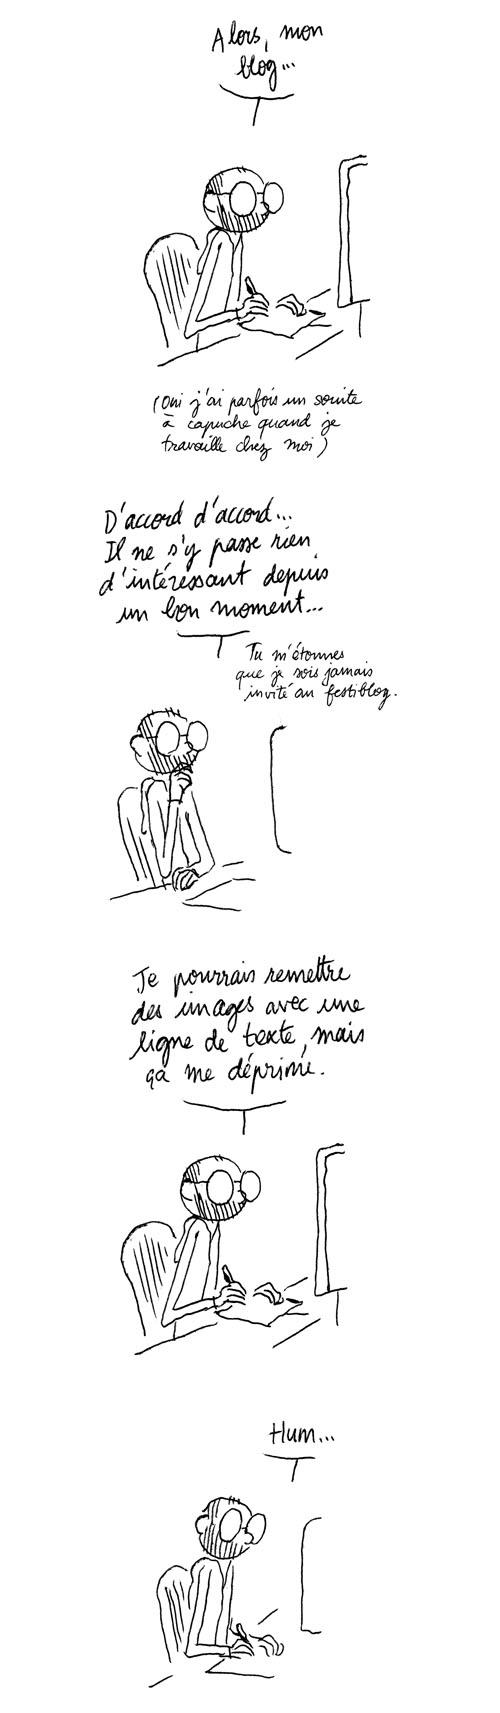 http://sorwellz.free.fr/blog2012/1105-1.jpg